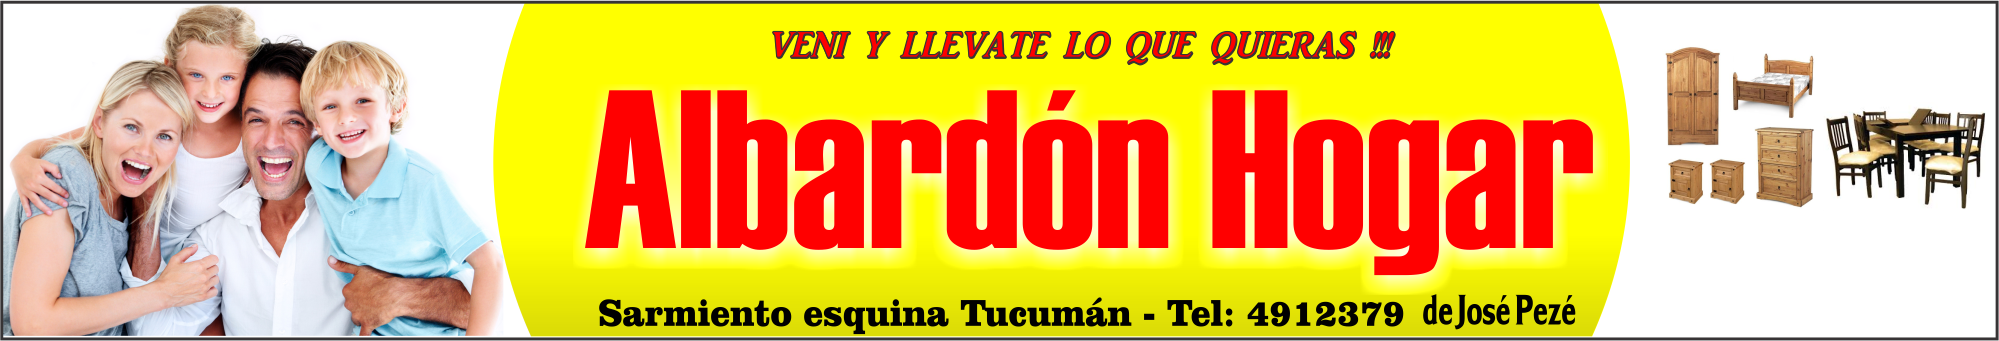 ALBARDON-HOGAR